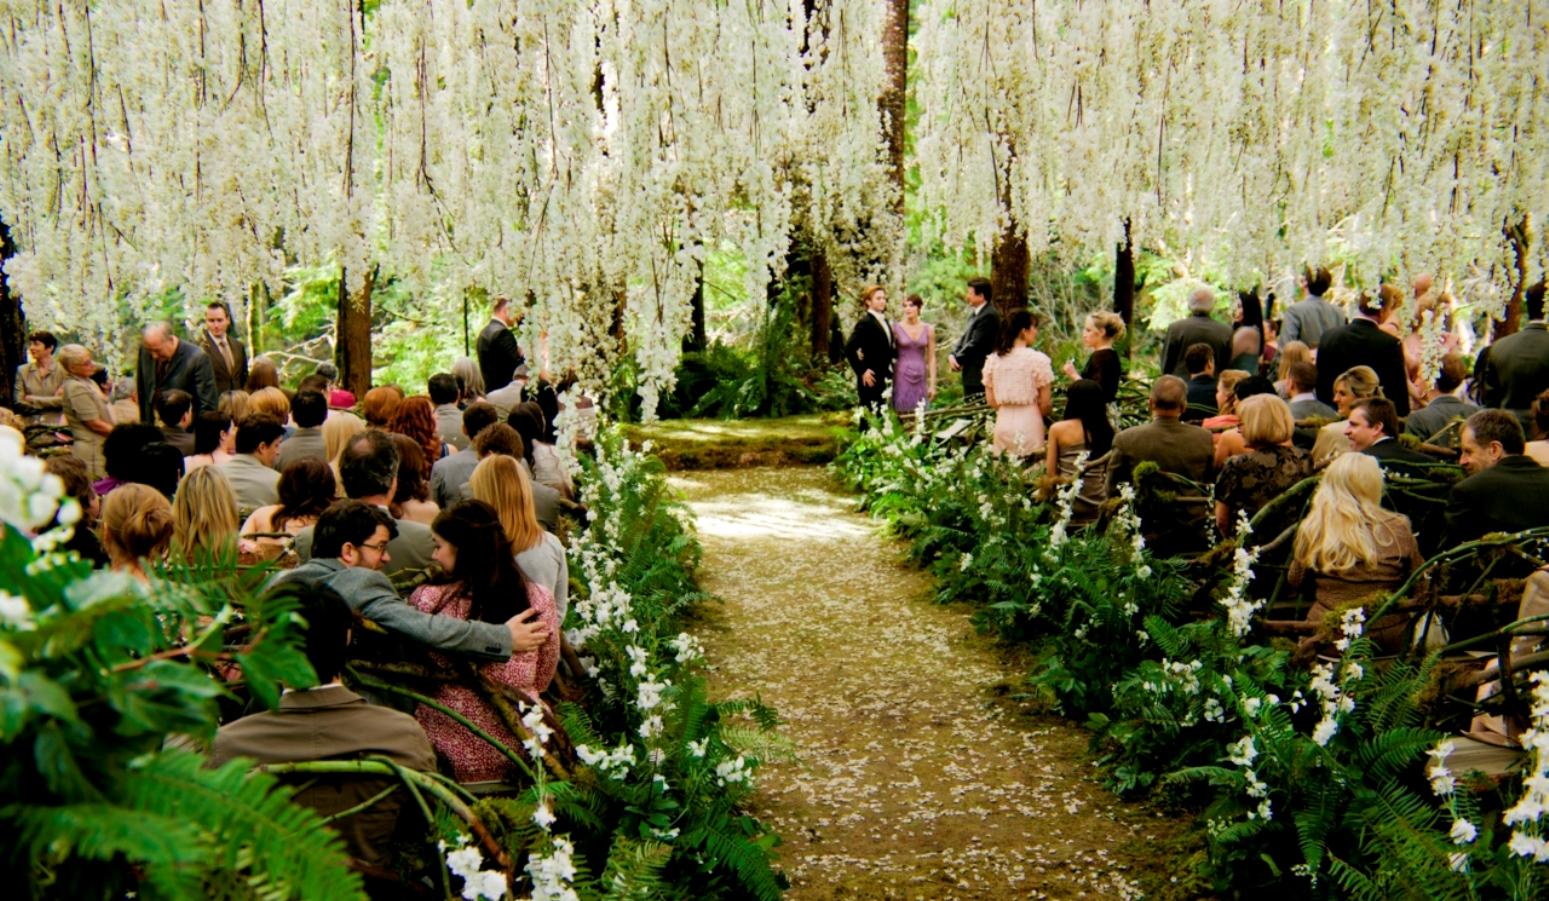 Tammy Carmona designed the often replicated wedding scene in Twilight: Breaking Dawn. Photo: courtesy